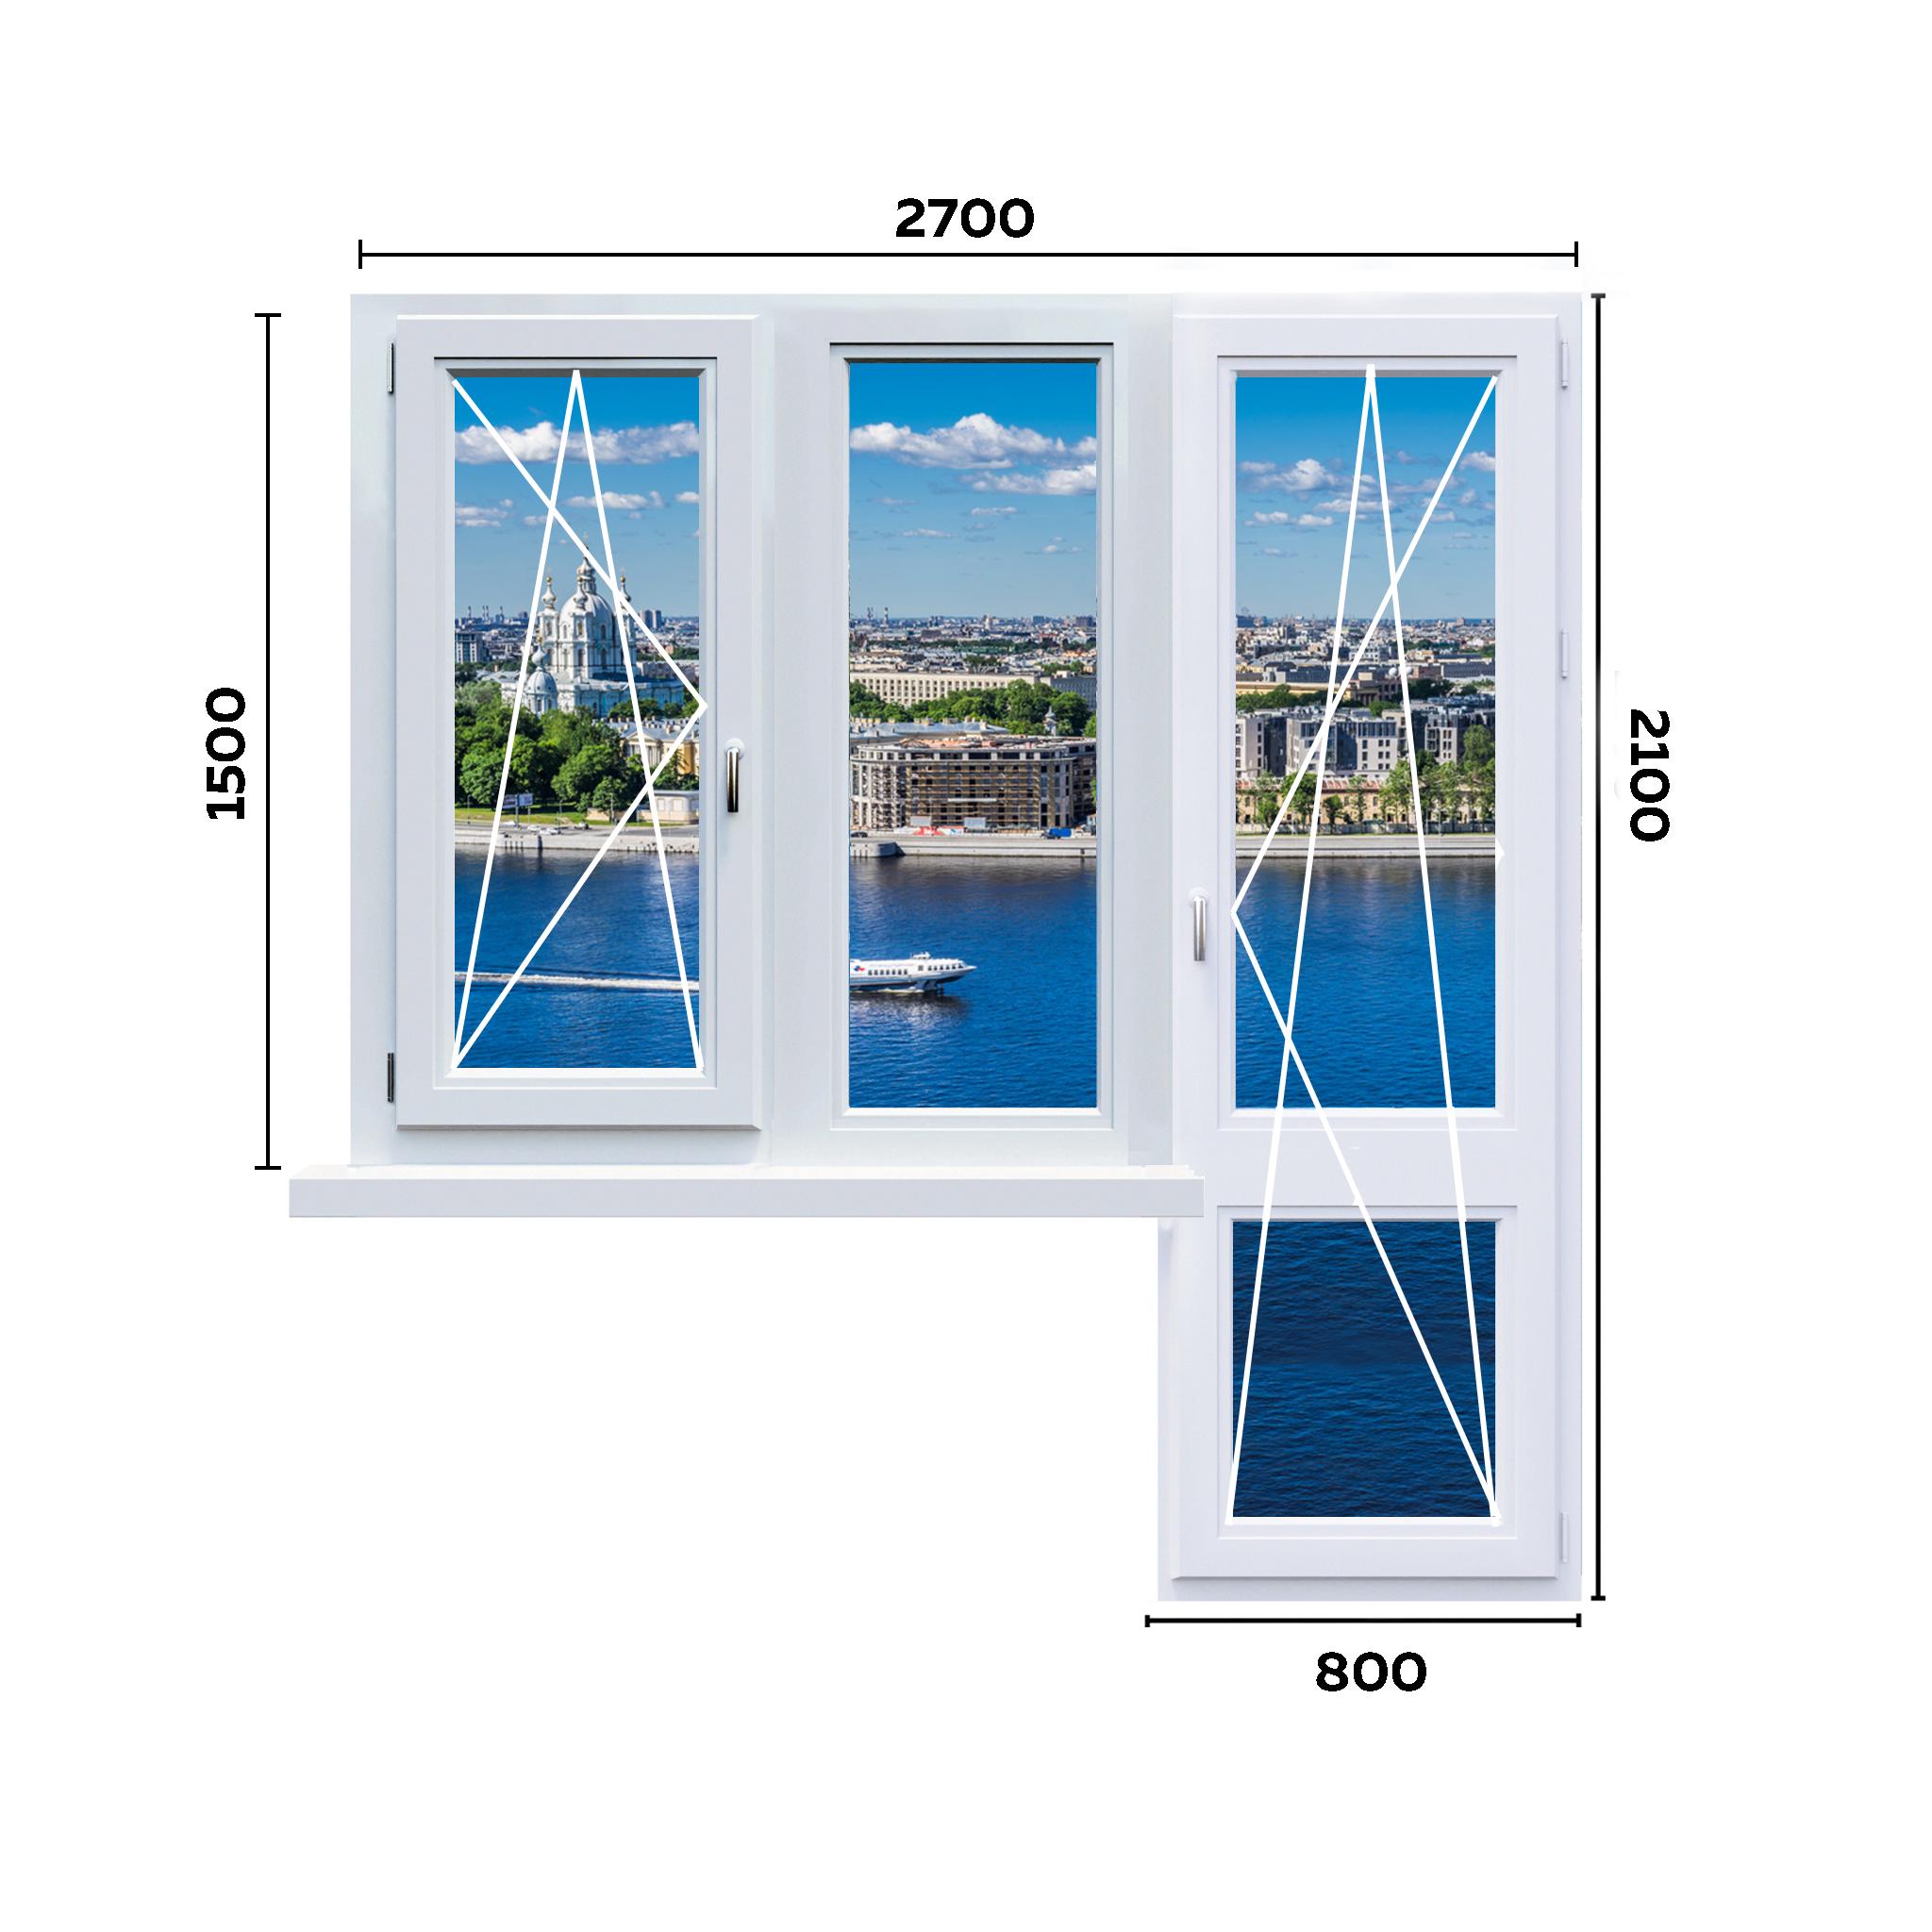 схема окна 2700мм вариант 3